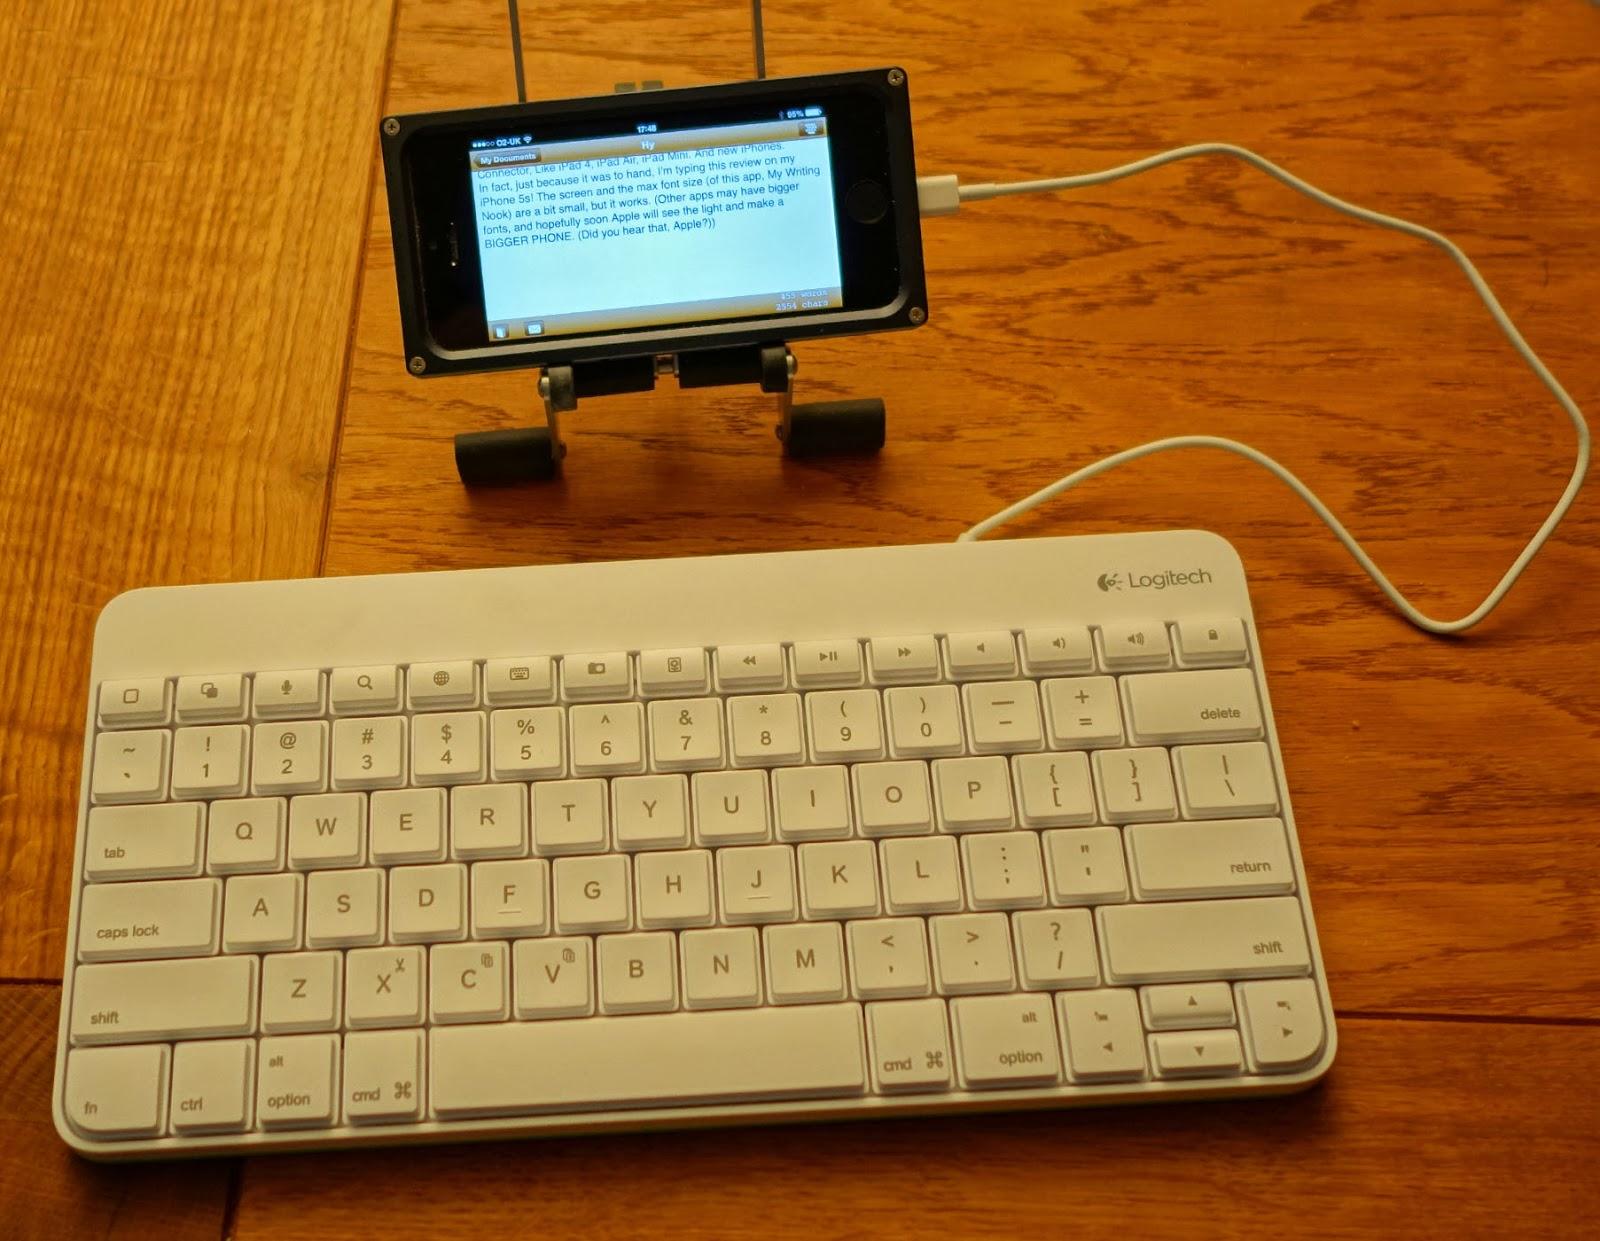 ereaderjoy a great portable writing station logitech wired keyboard clicky. Black Bedroom Furniture Sets. Home Design Ideas